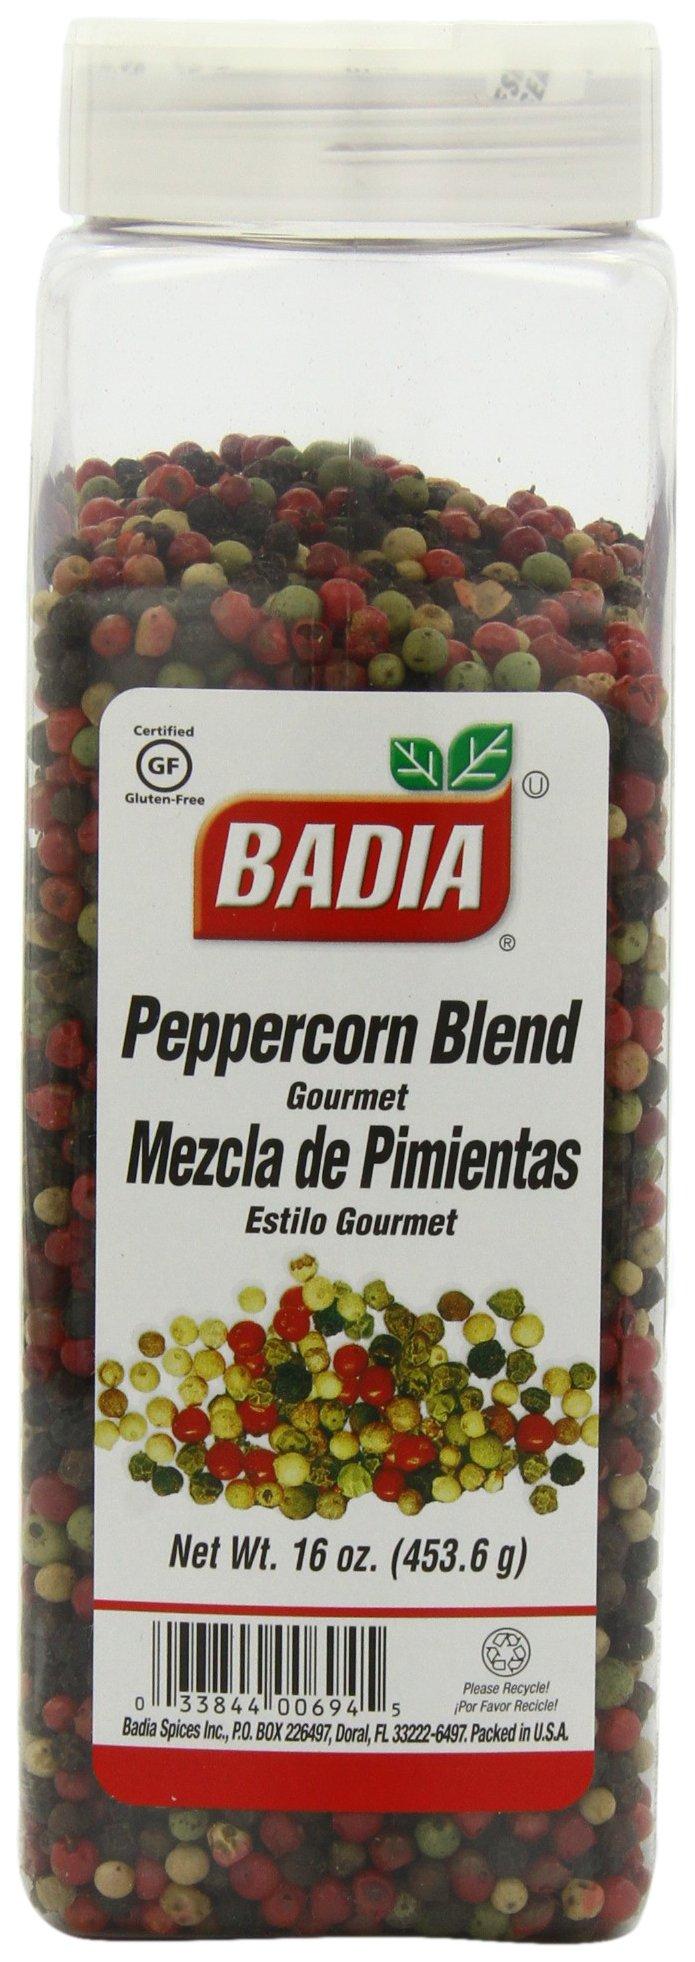 Badia Gourmet Peppercorn Blend, 16-ounces